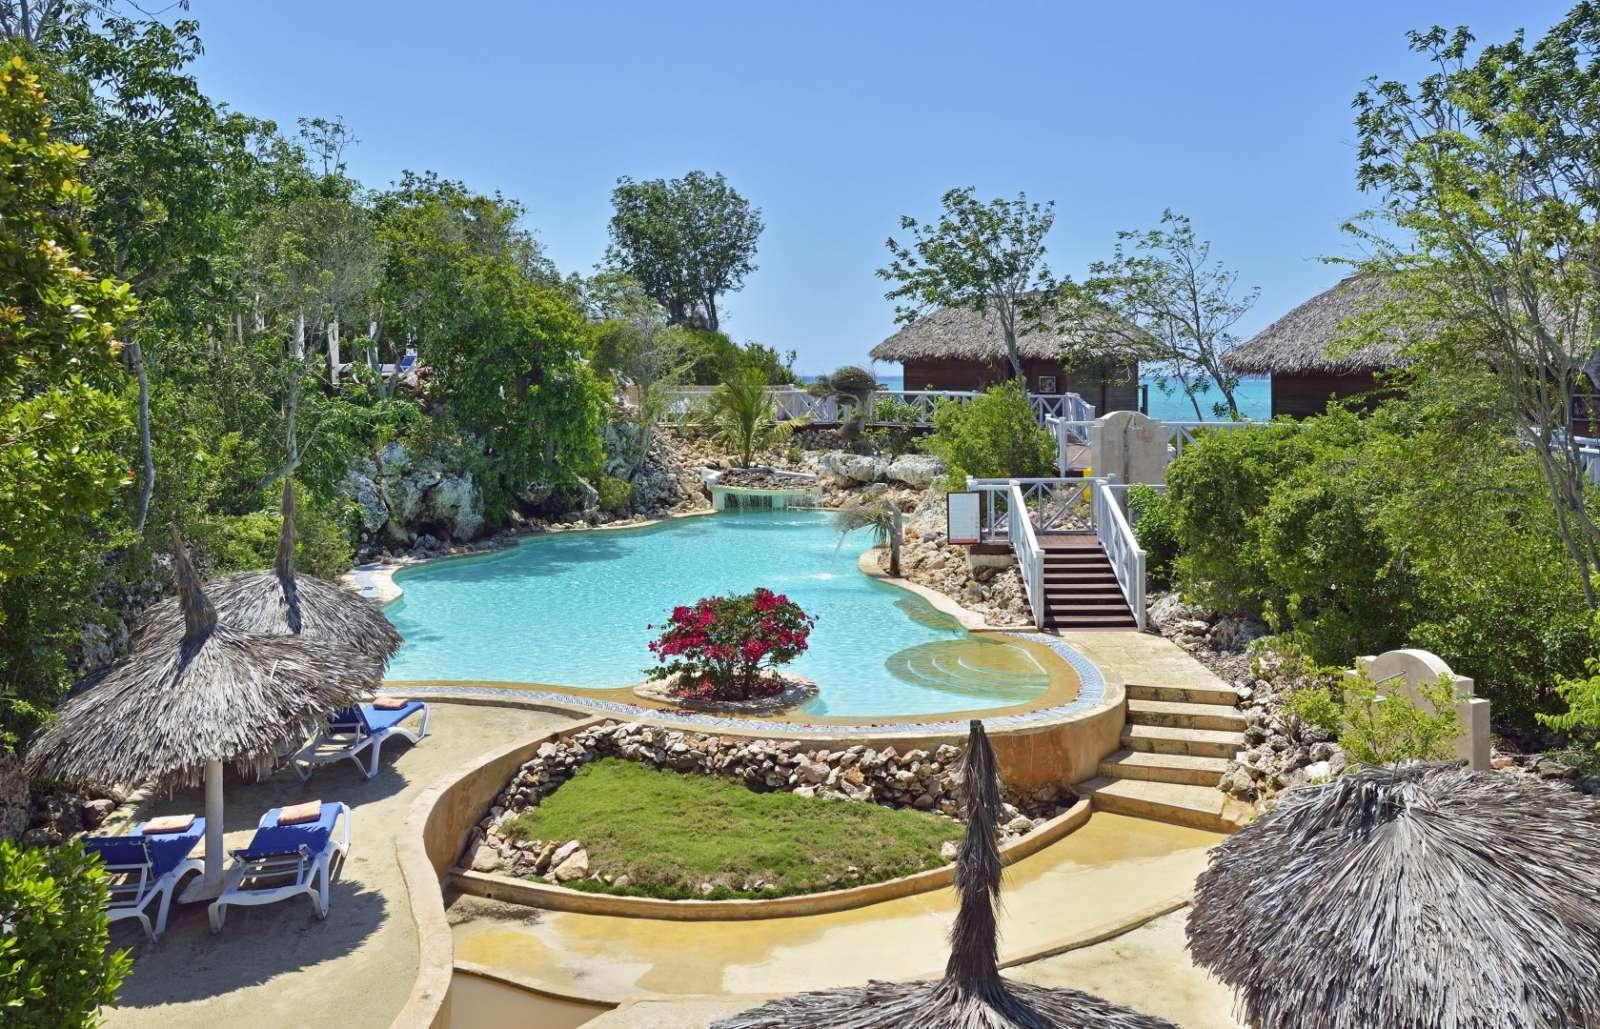 Yhi Spa pool at Paradisus Rio de Oro